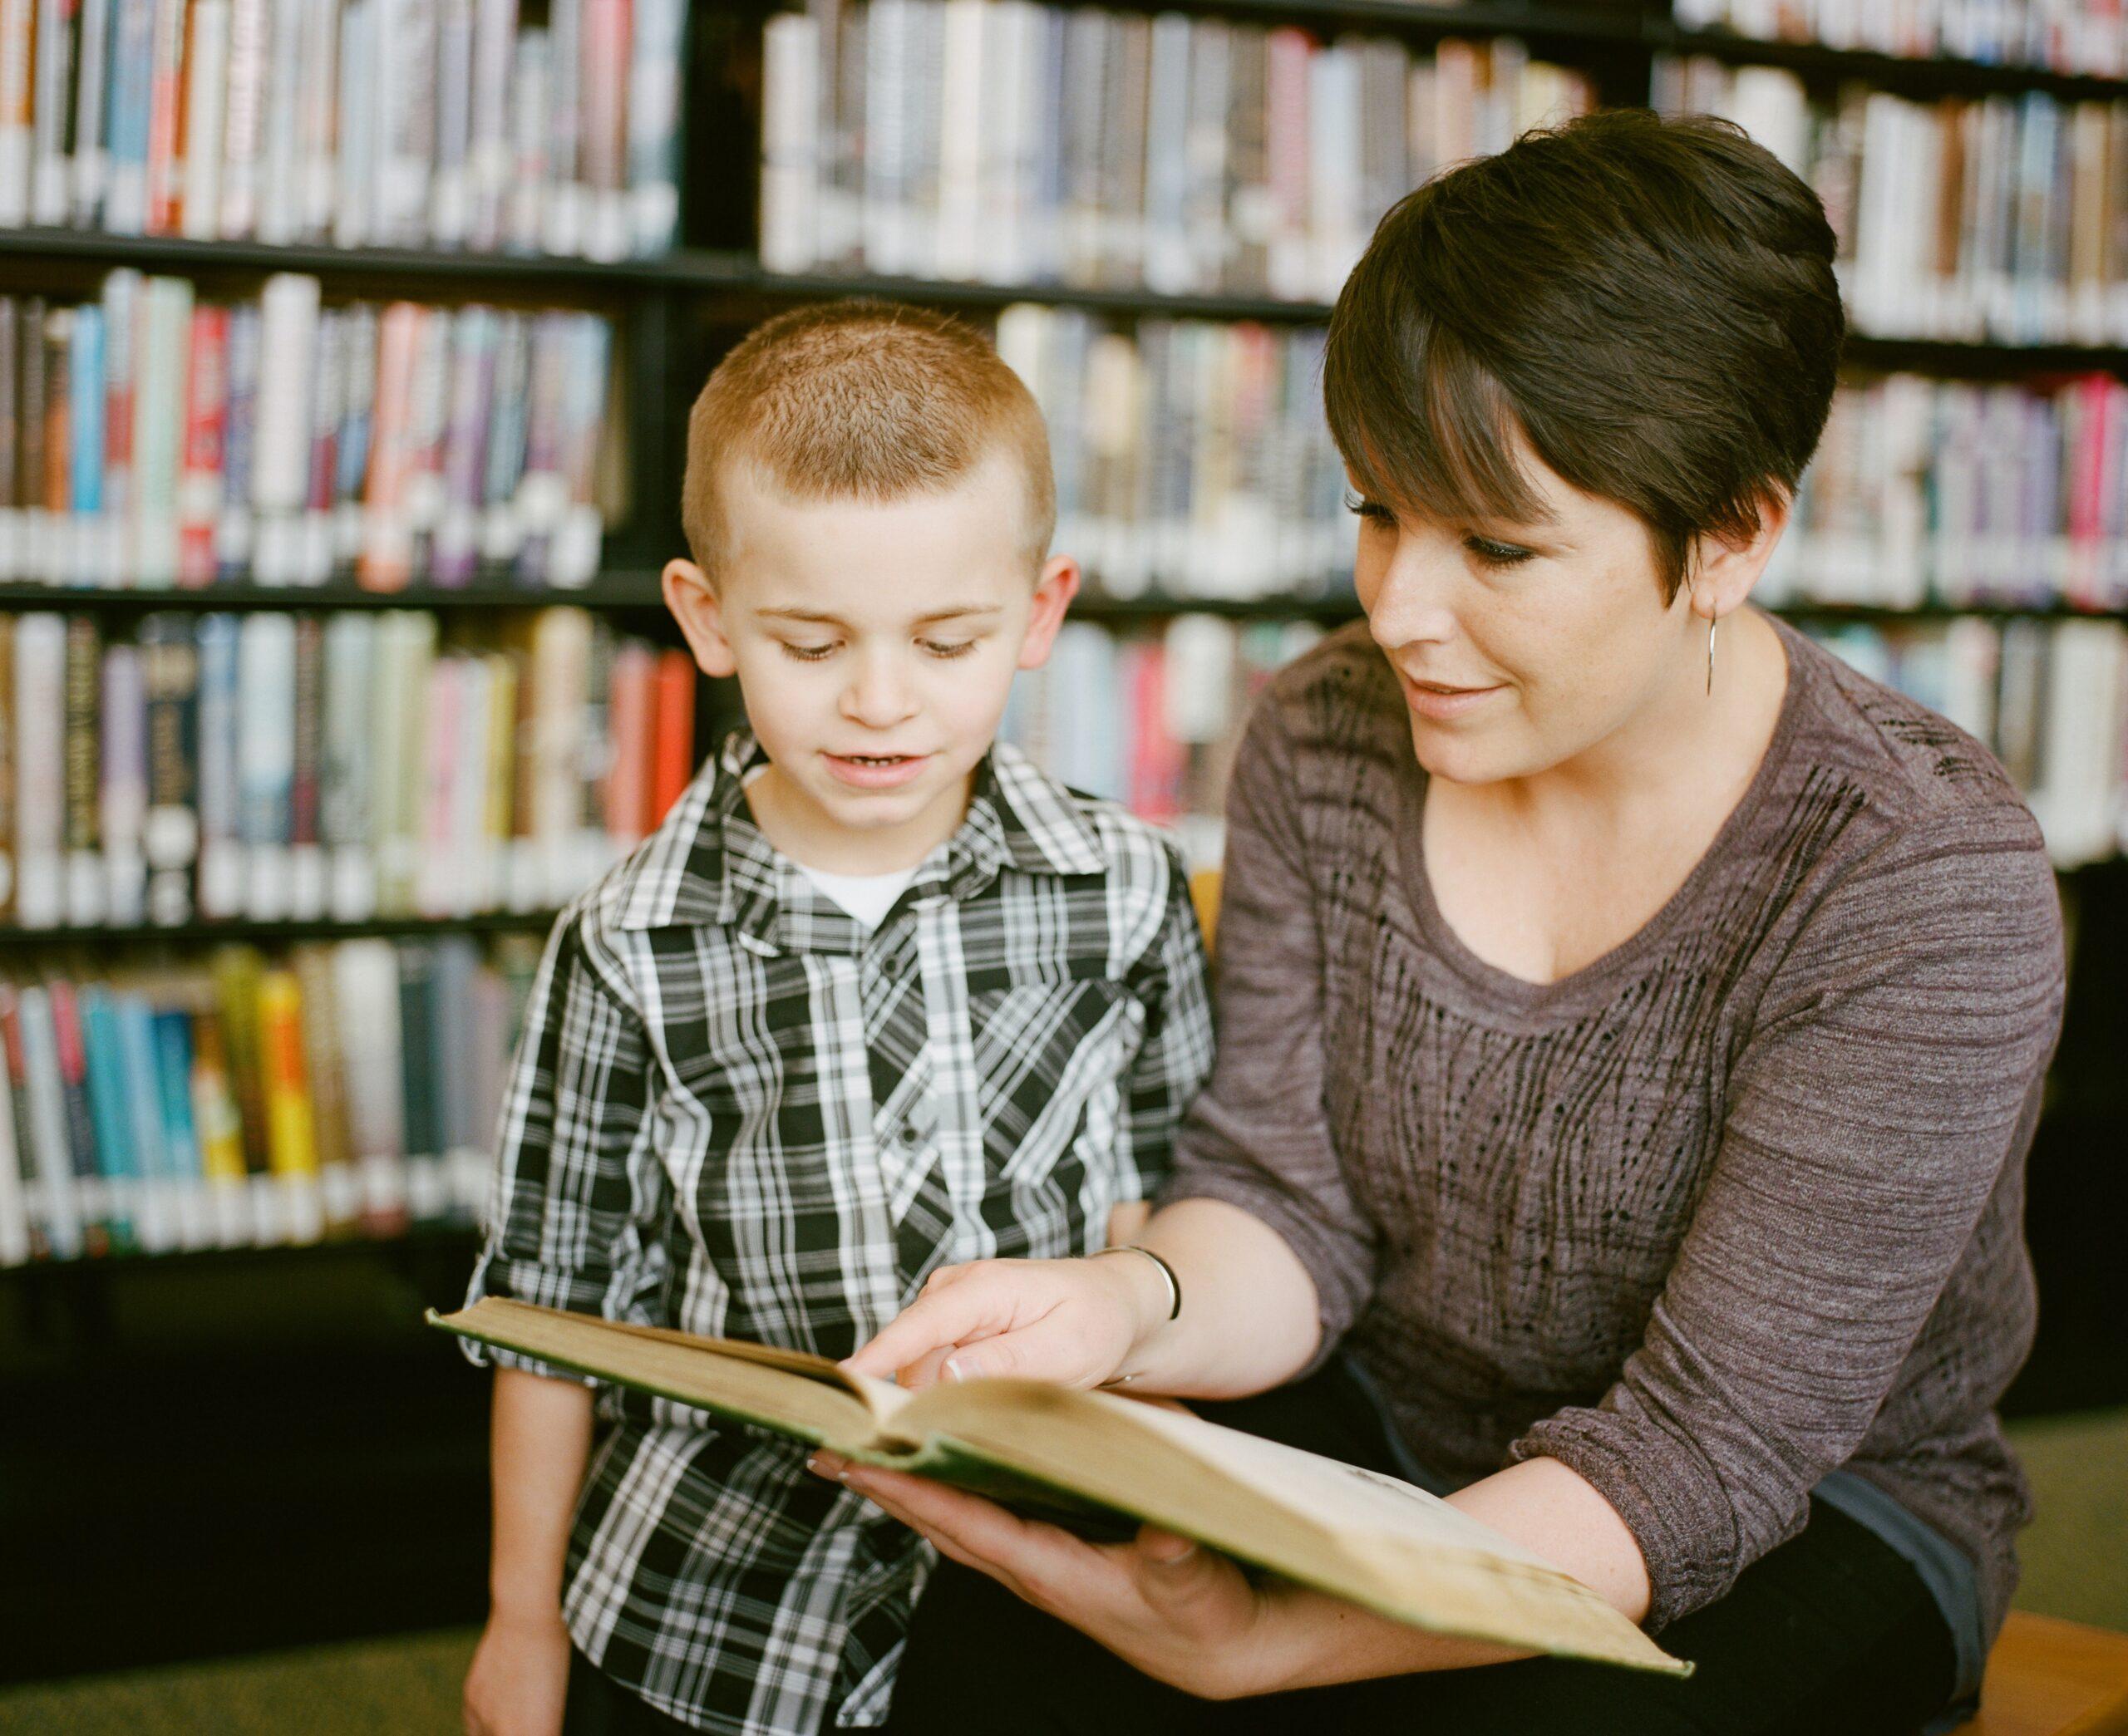 teacher pension plan - teacher reading to a child